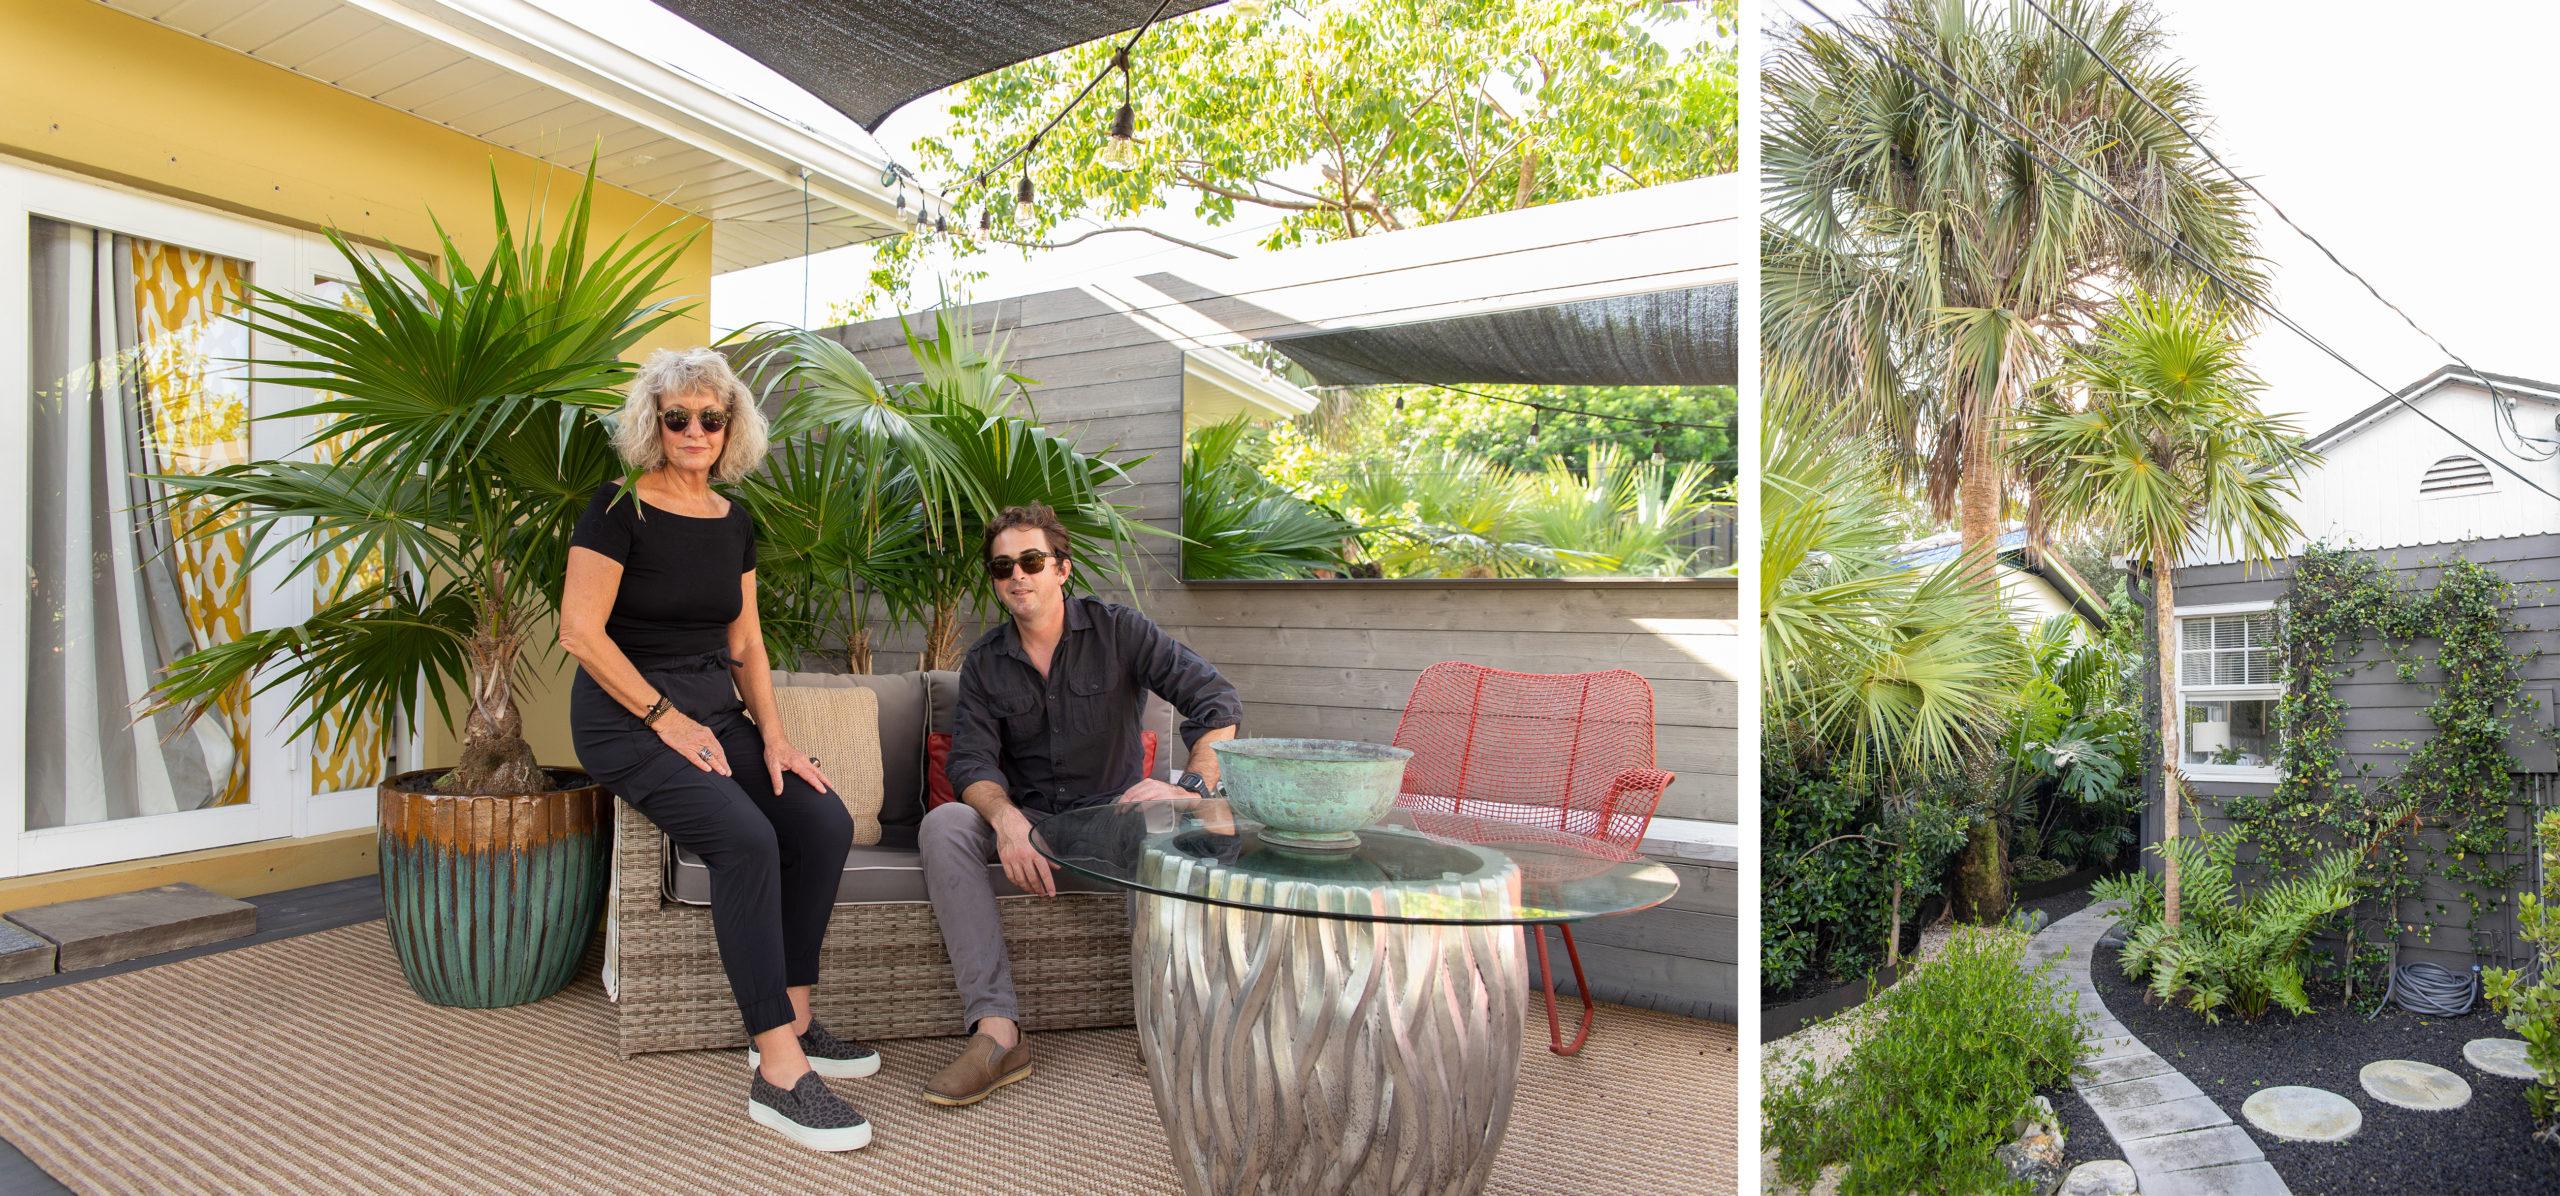 Debra Yates & Ben Burle in an upscale landscape featuring native plants